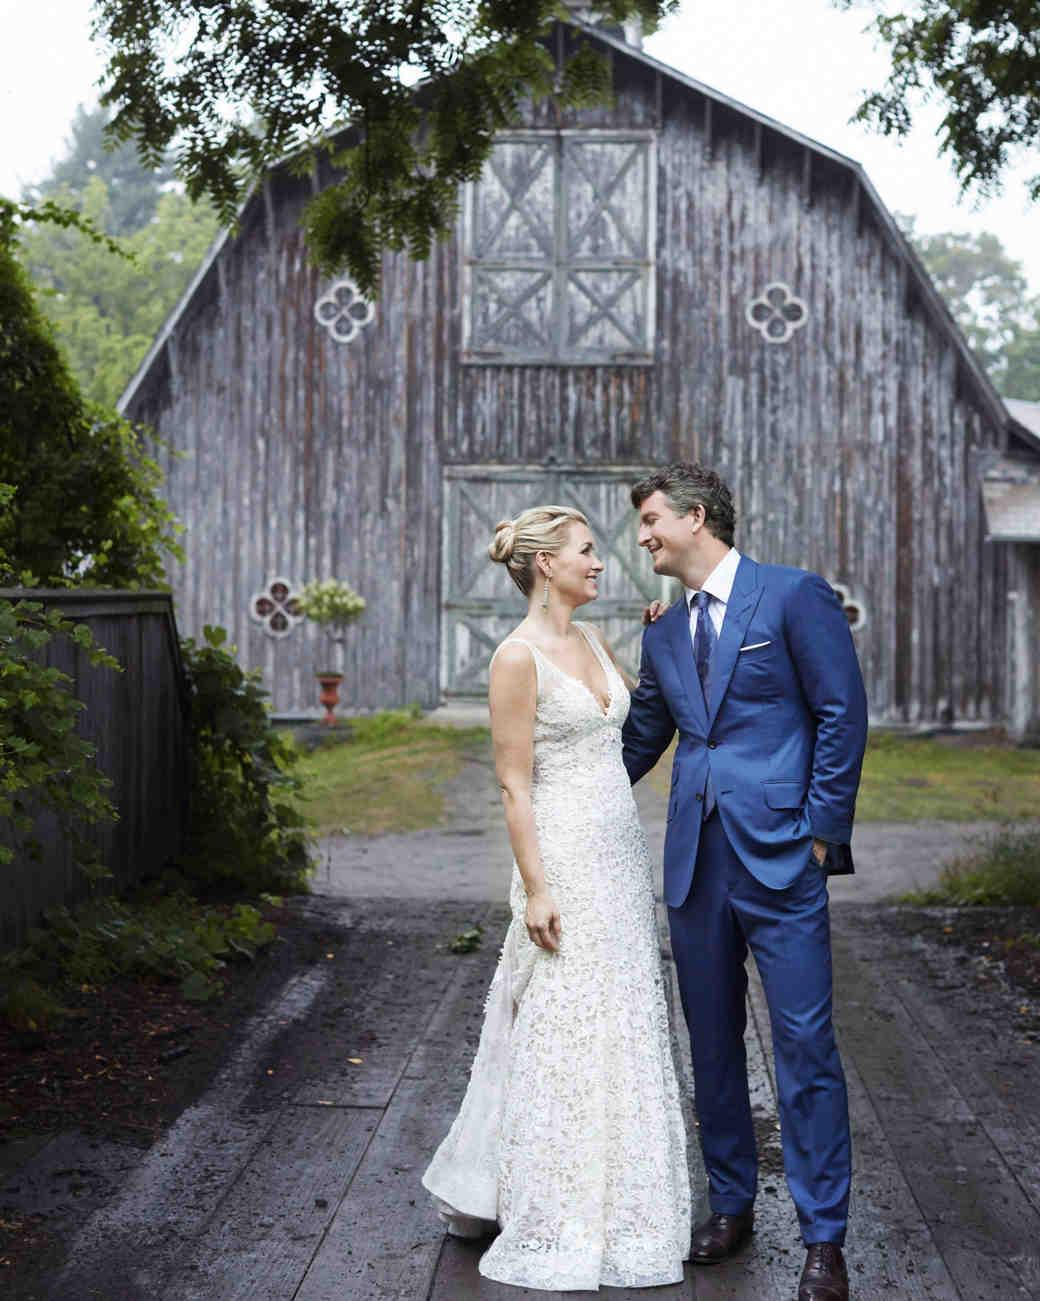 joyann jeremy wedding barn locusts on hudson